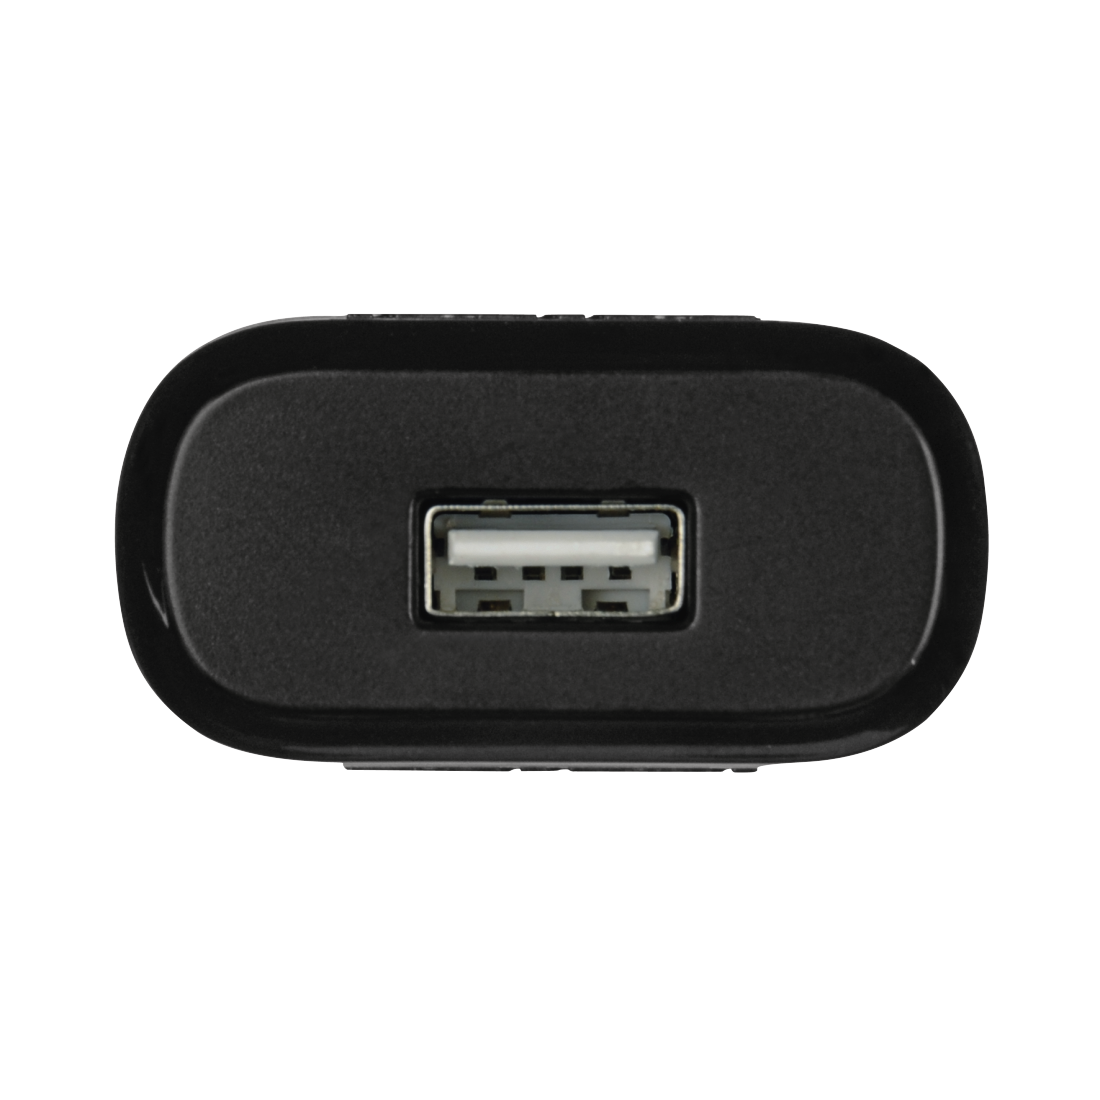 108341 hama kit chargeur pour tablettes pc samsung galaxy. Black Bedroom Furniture Sets. Home Design Ideas